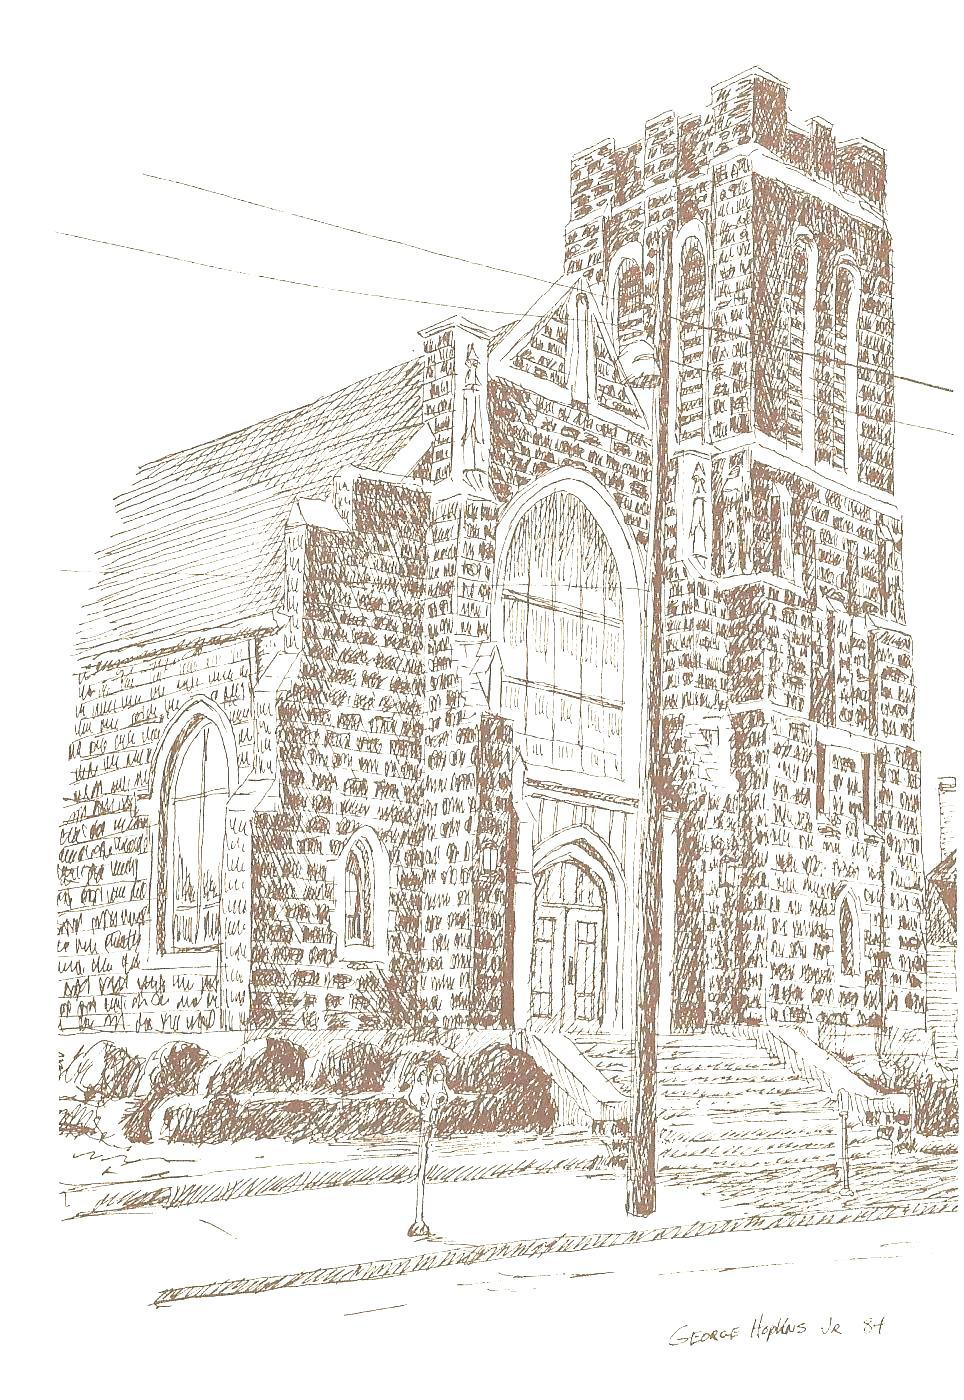 Historical Steubenville Churches - Steubenville Visitor Center